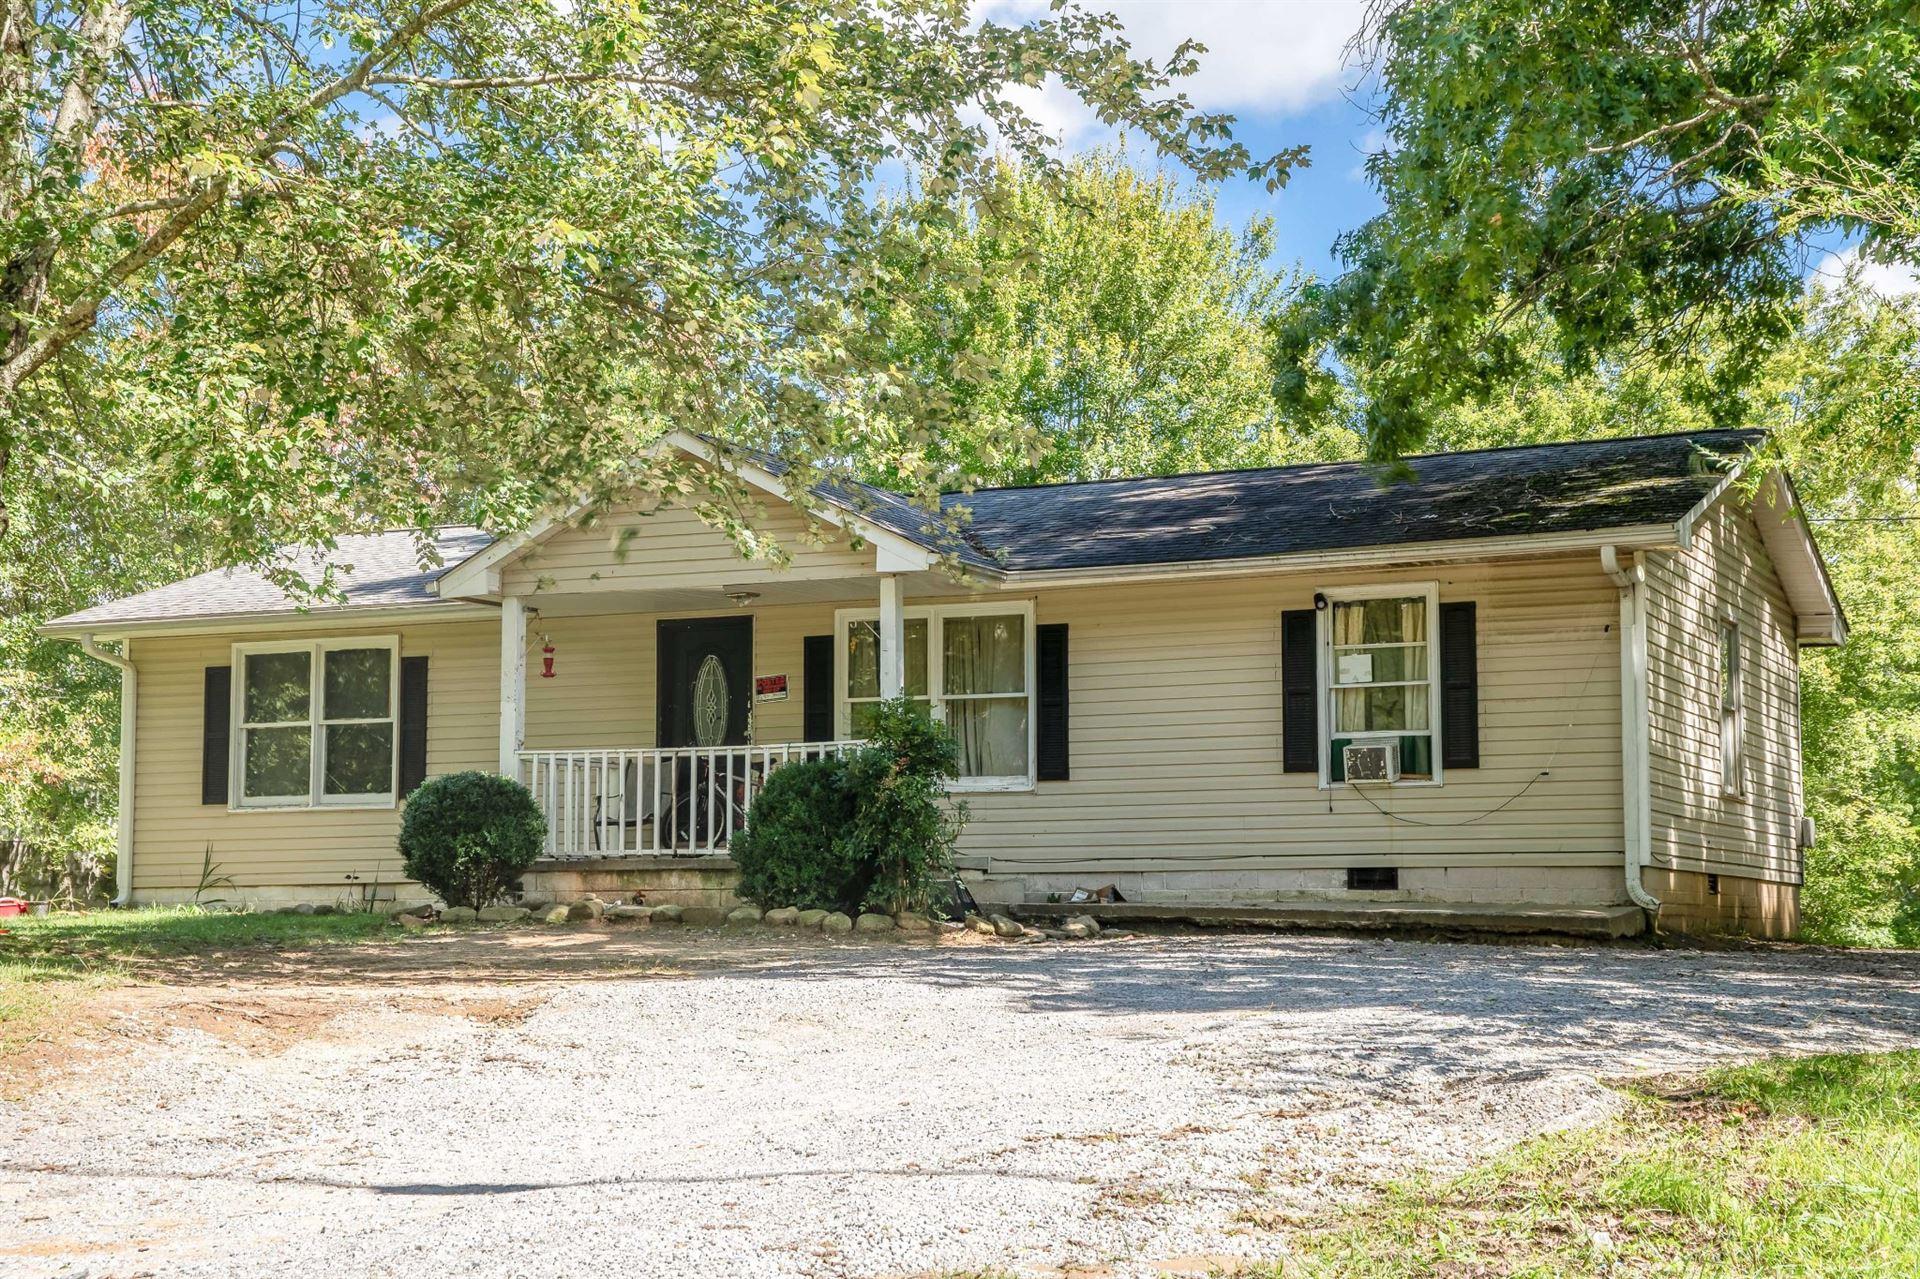 1136 Trussell Rd, Monteagle, TN 37356 - MLS#: 2288142